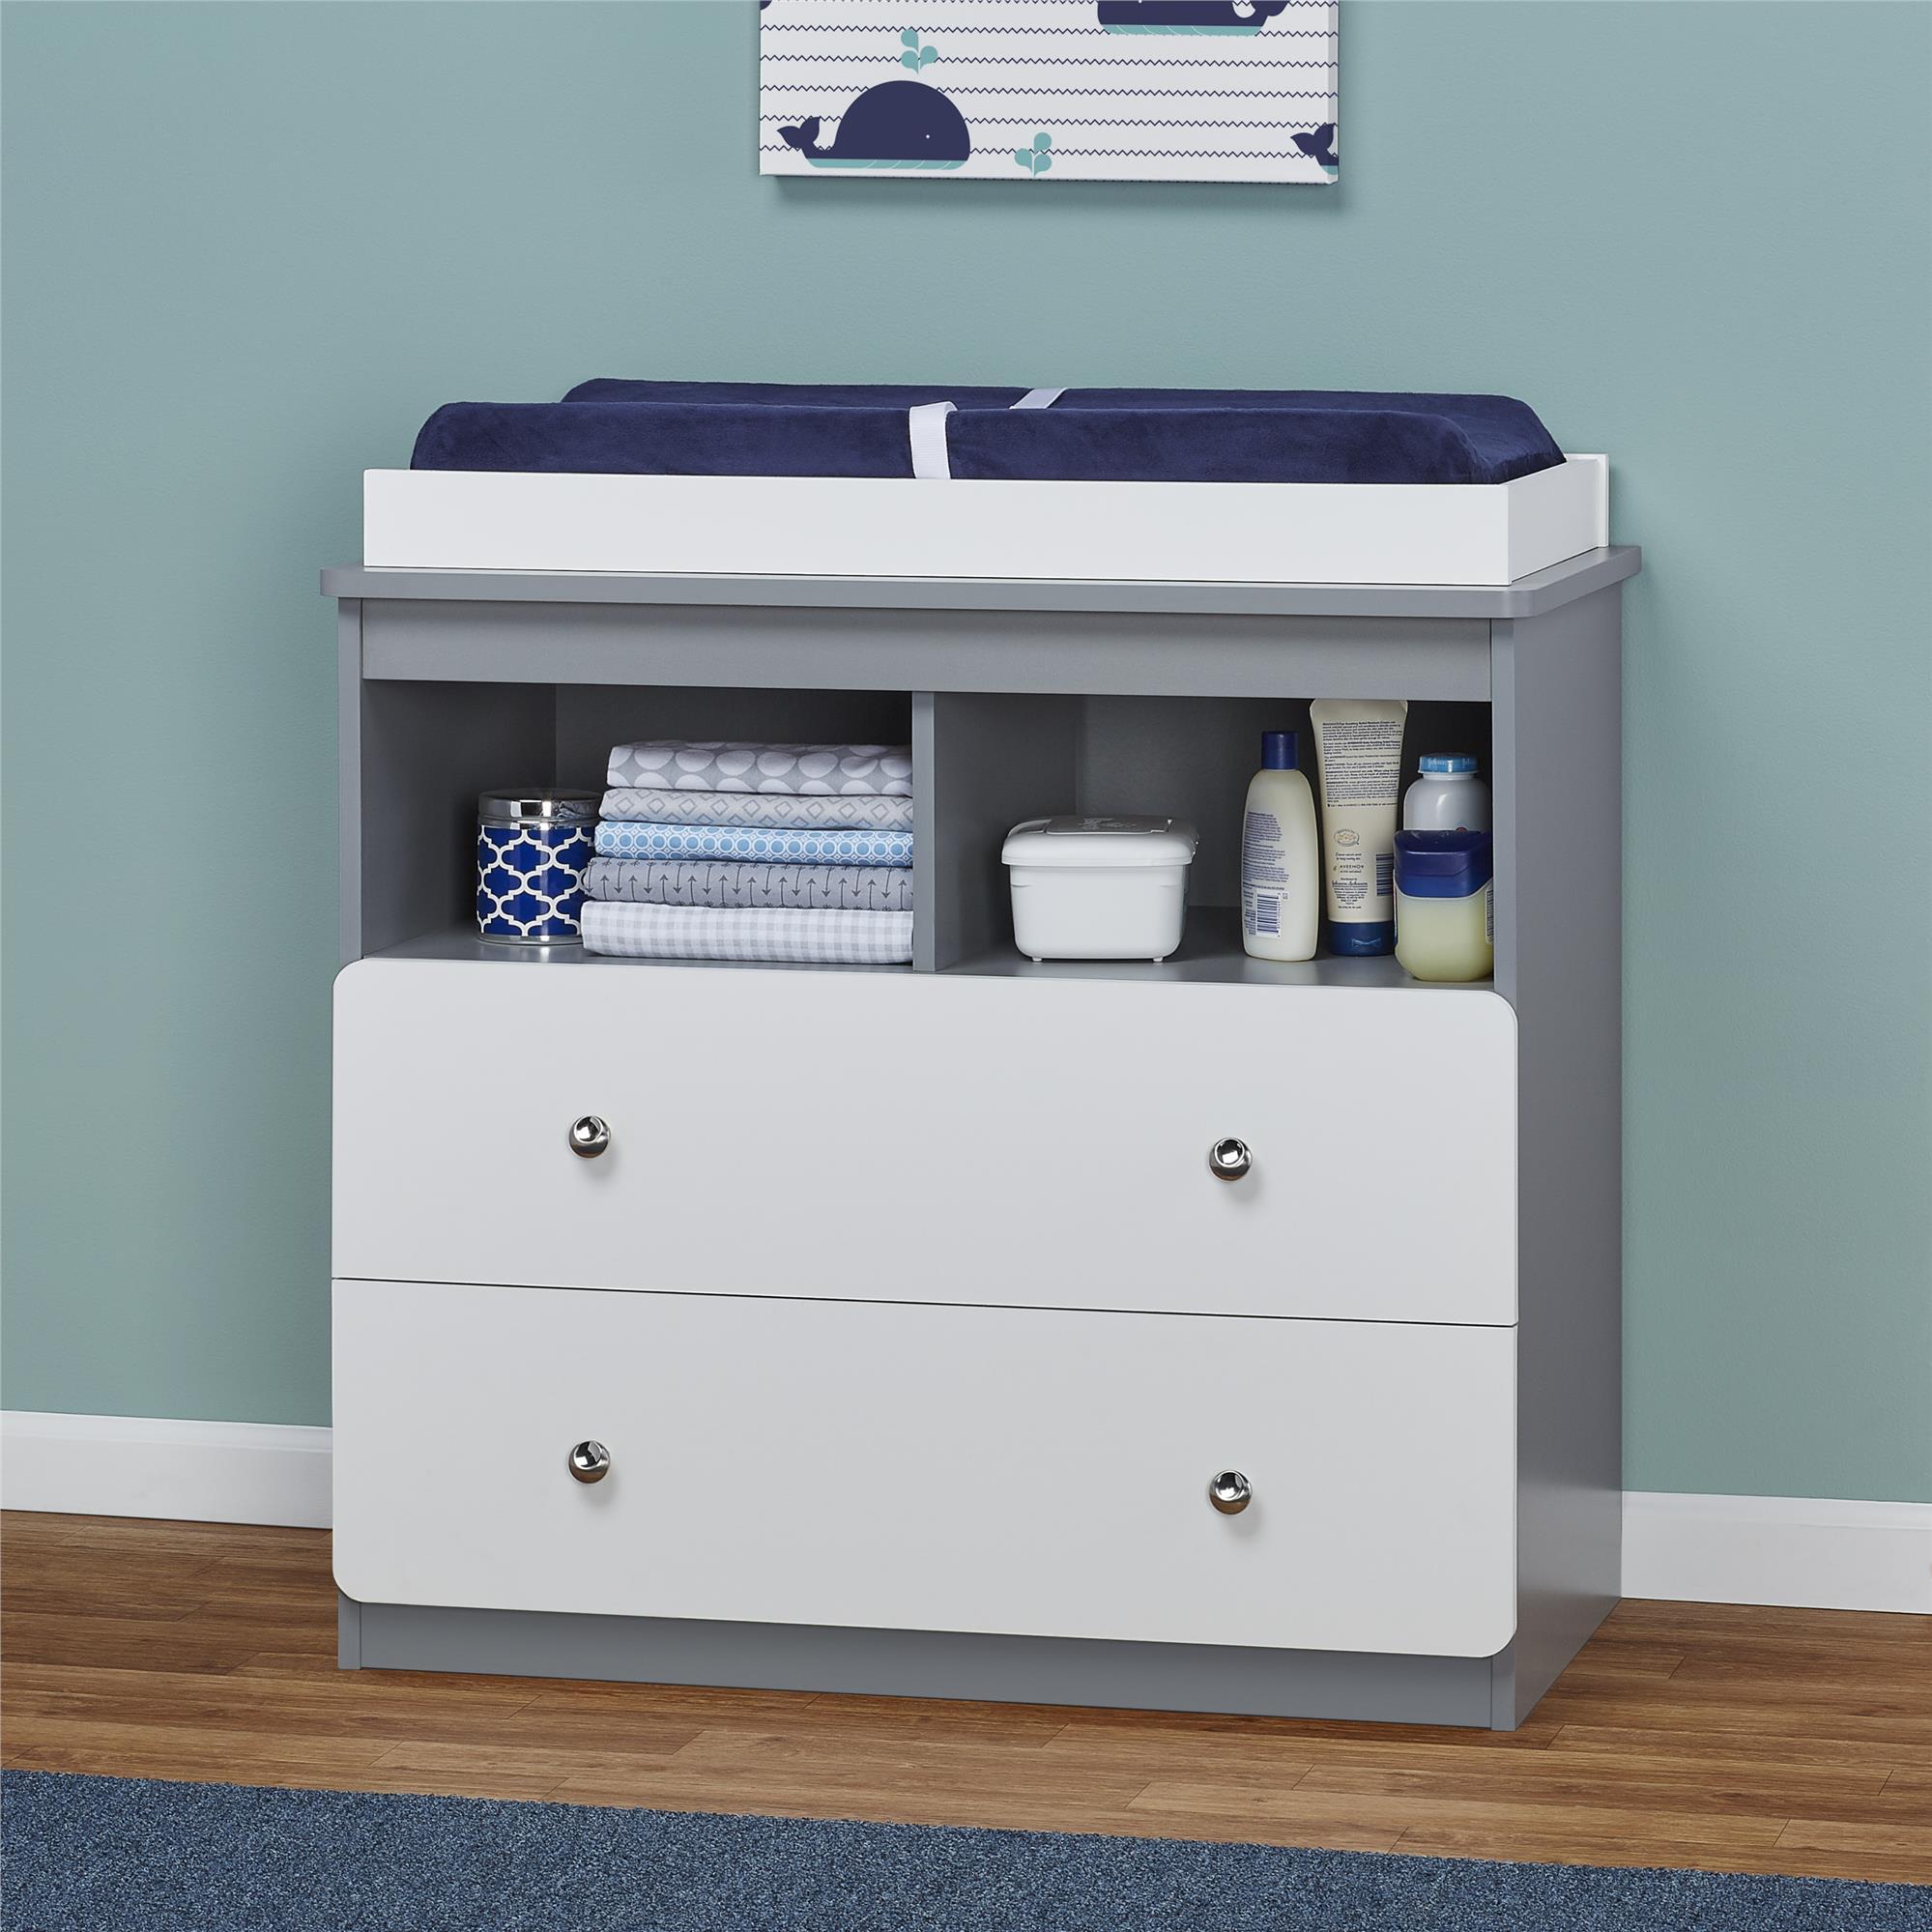 Nursery Changing Table Storage Drawers Shelves Diaper Station Dresser Furniture  eBay